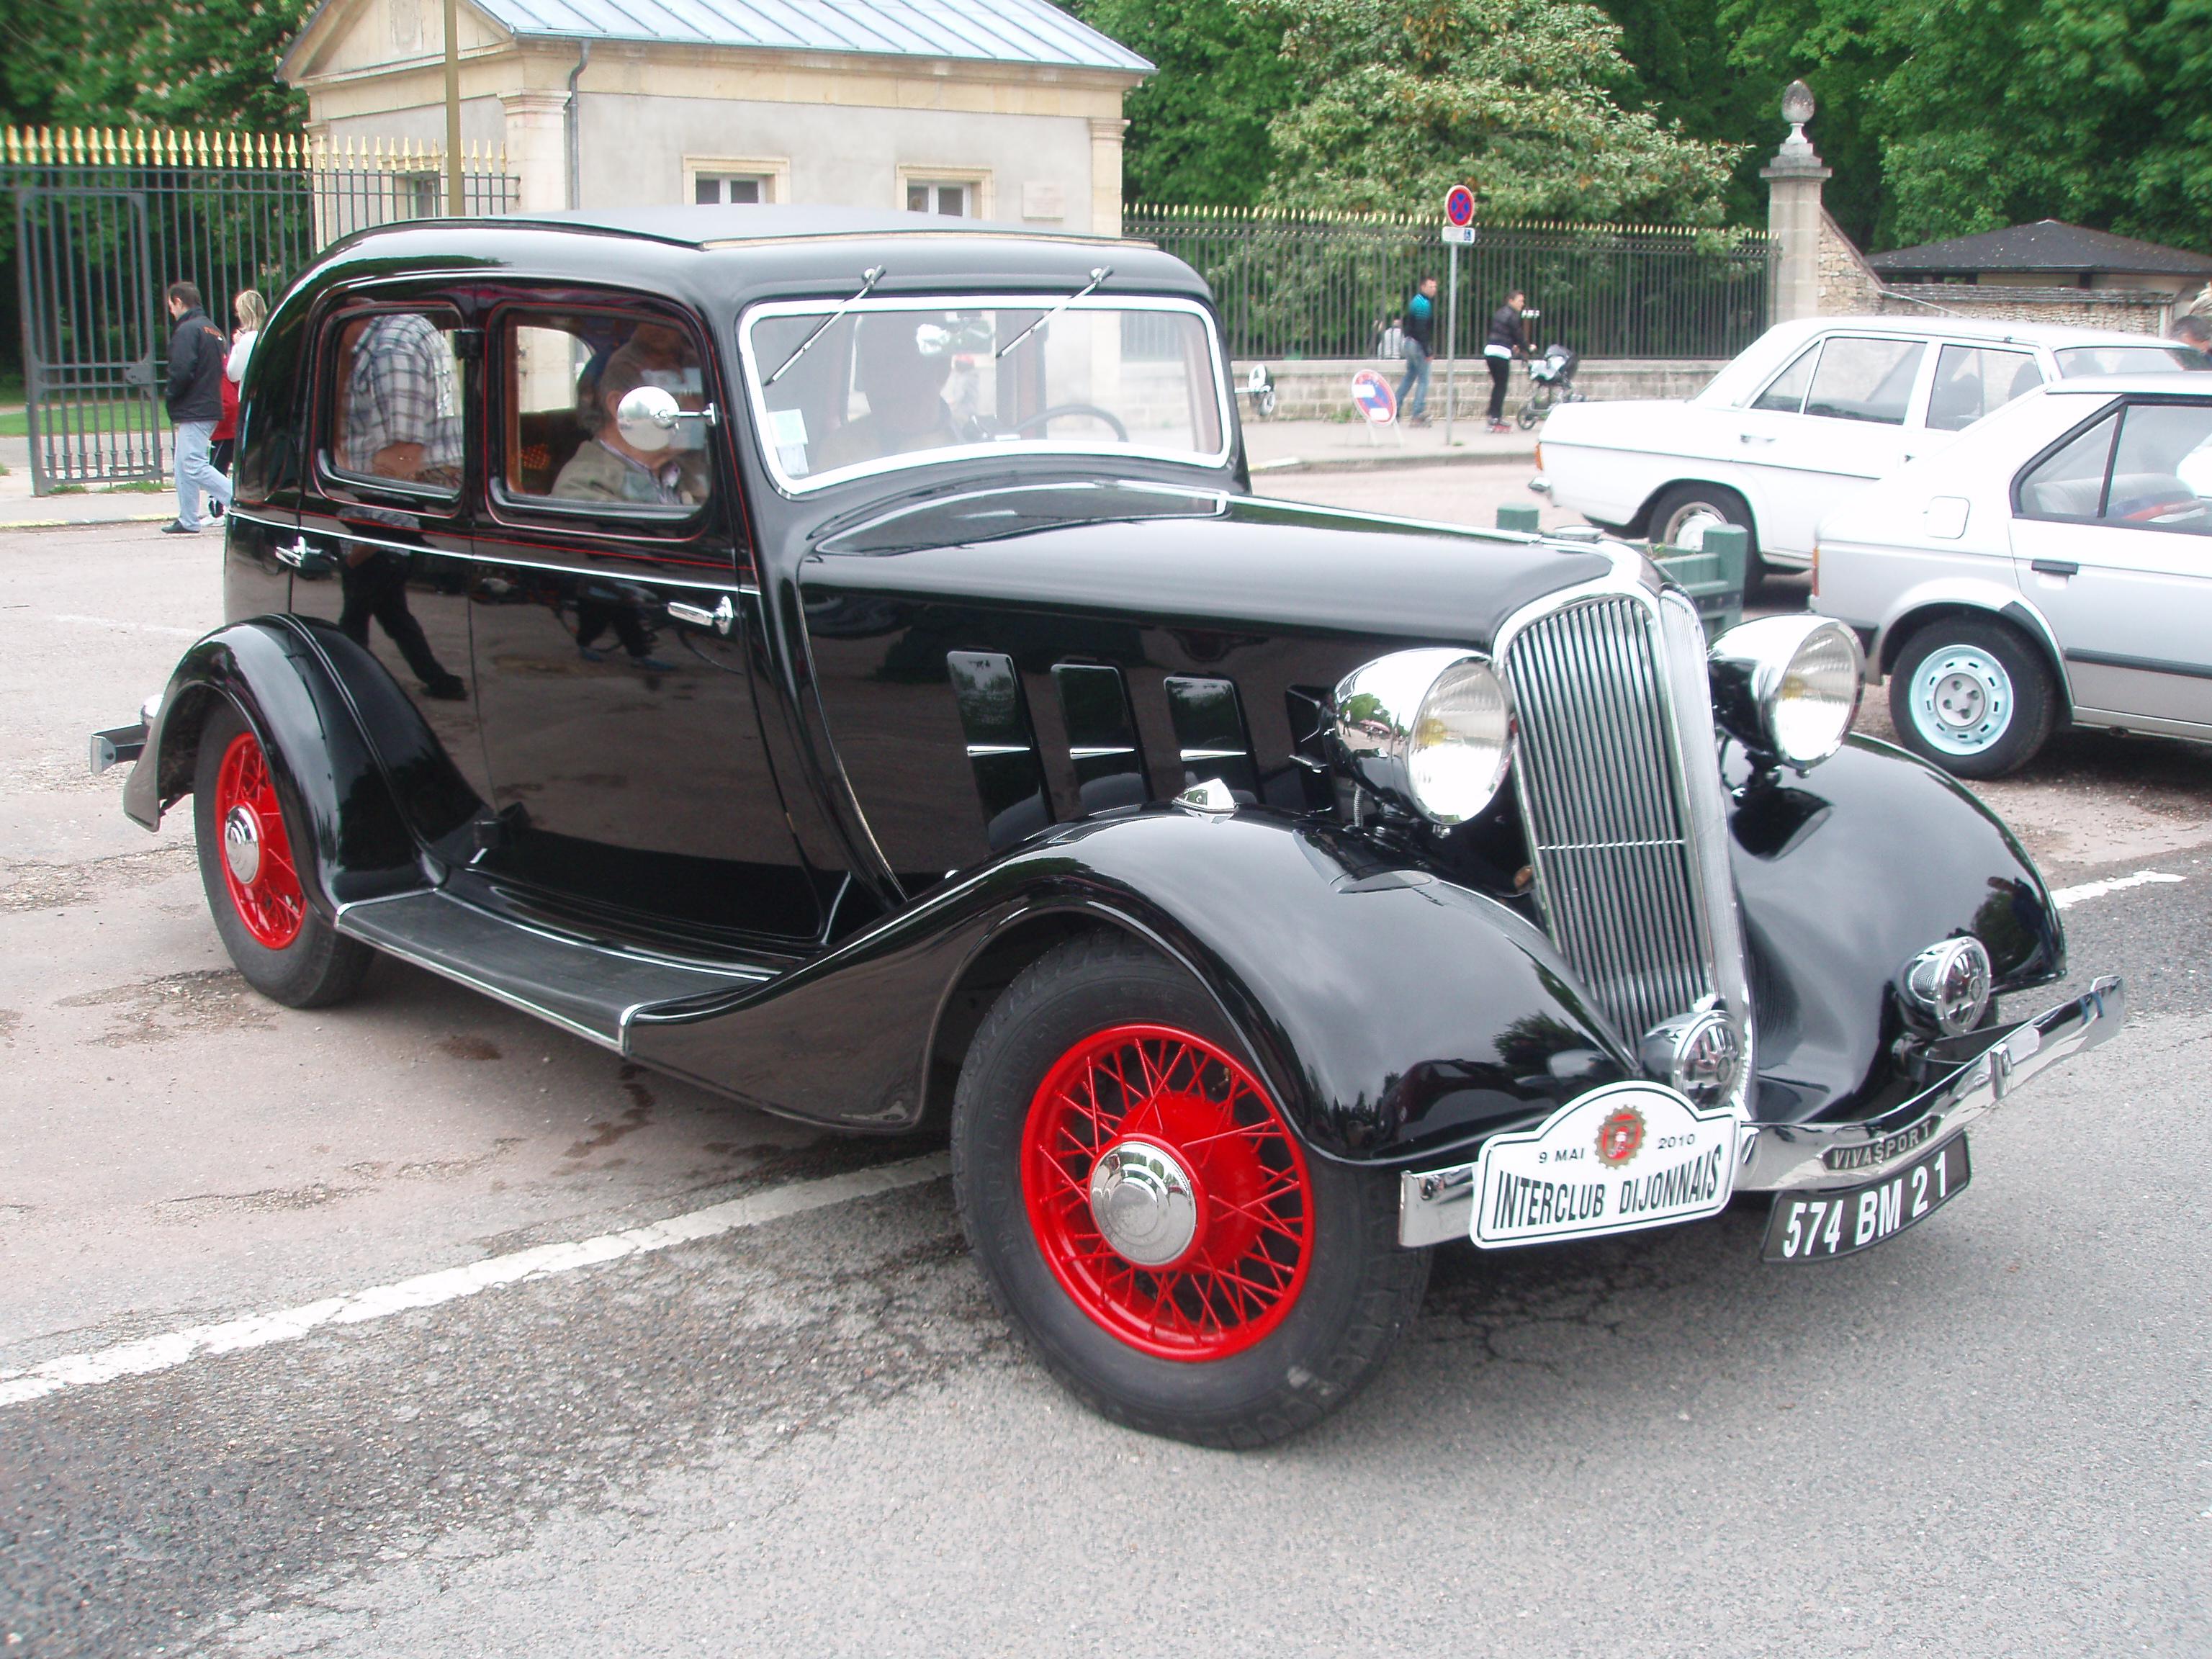 Renault Vivasport